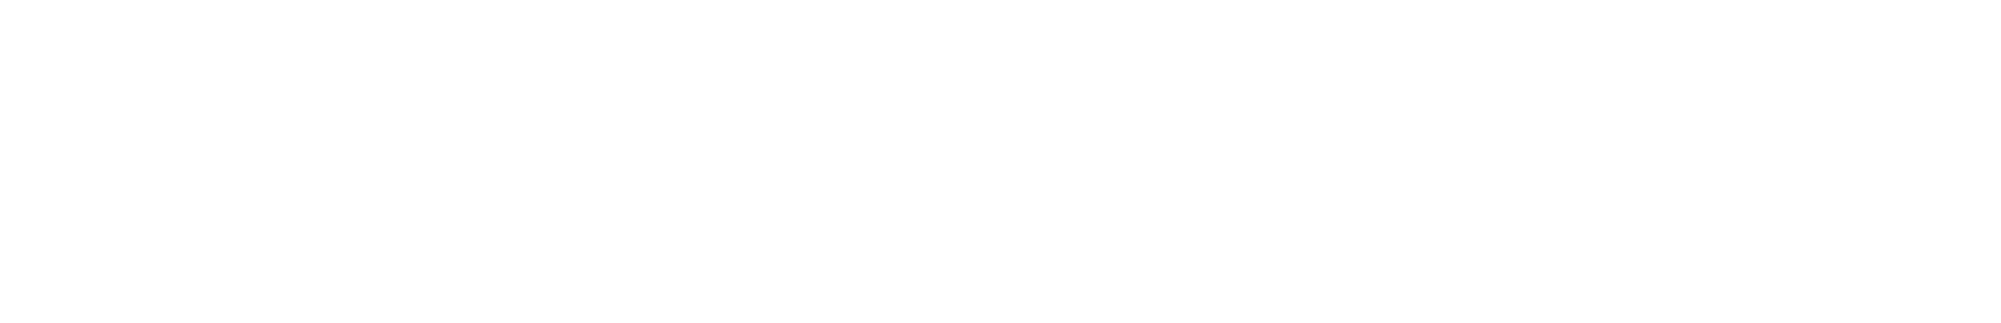 ladebusiness logo white